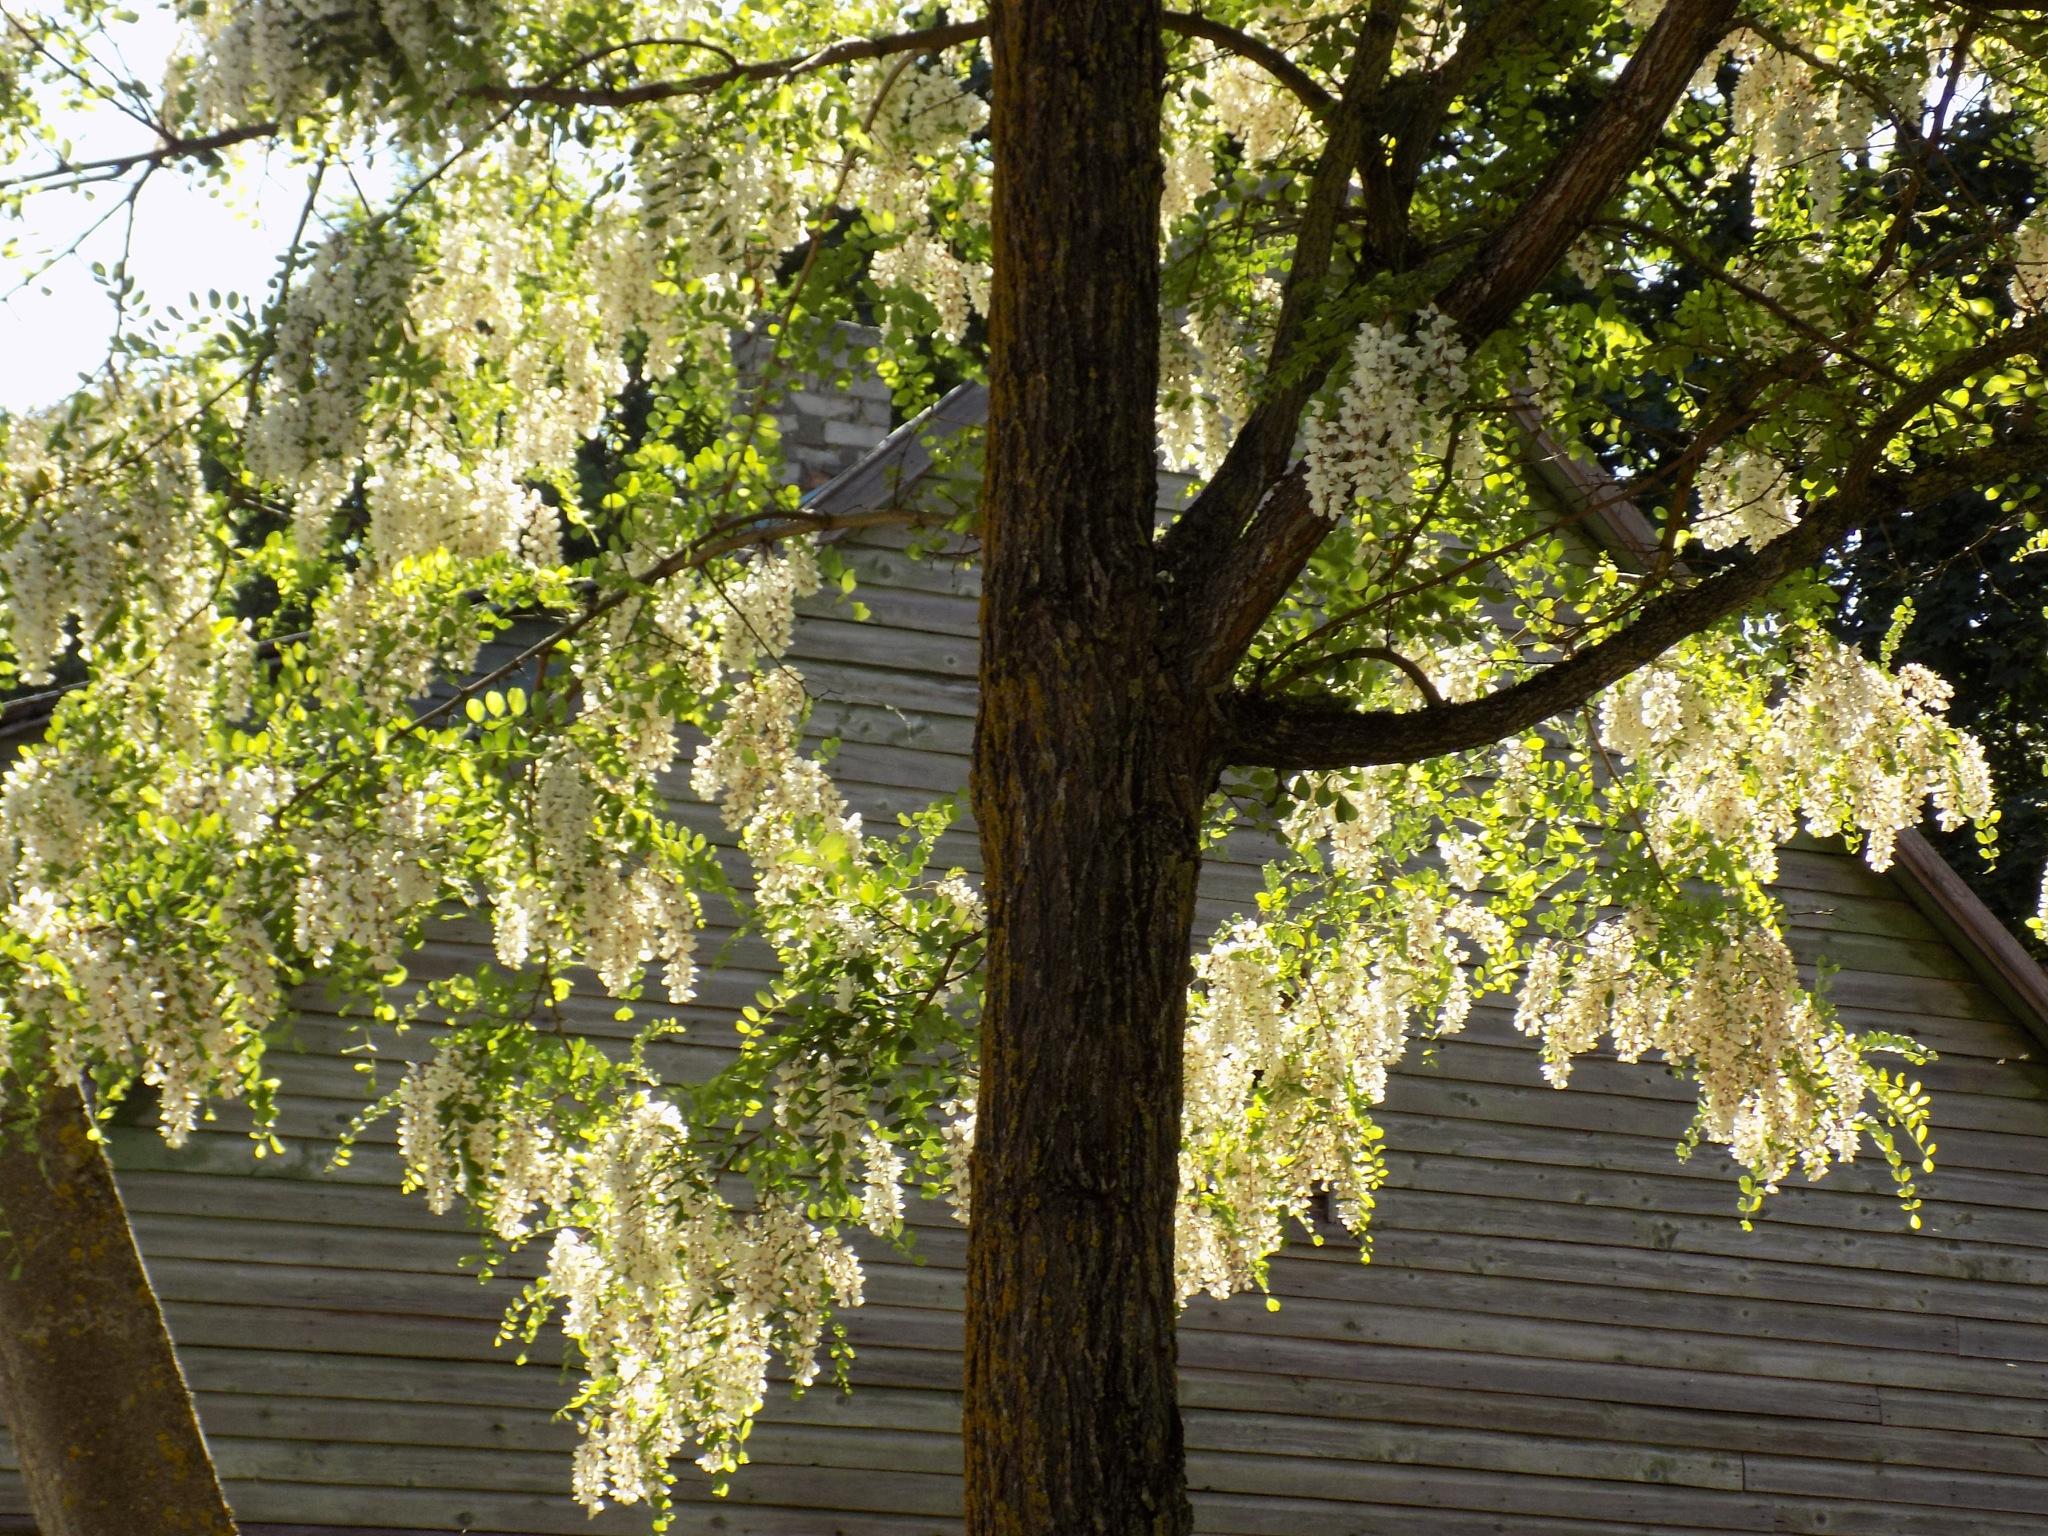 Tree in the spring by uzkuraitiene62